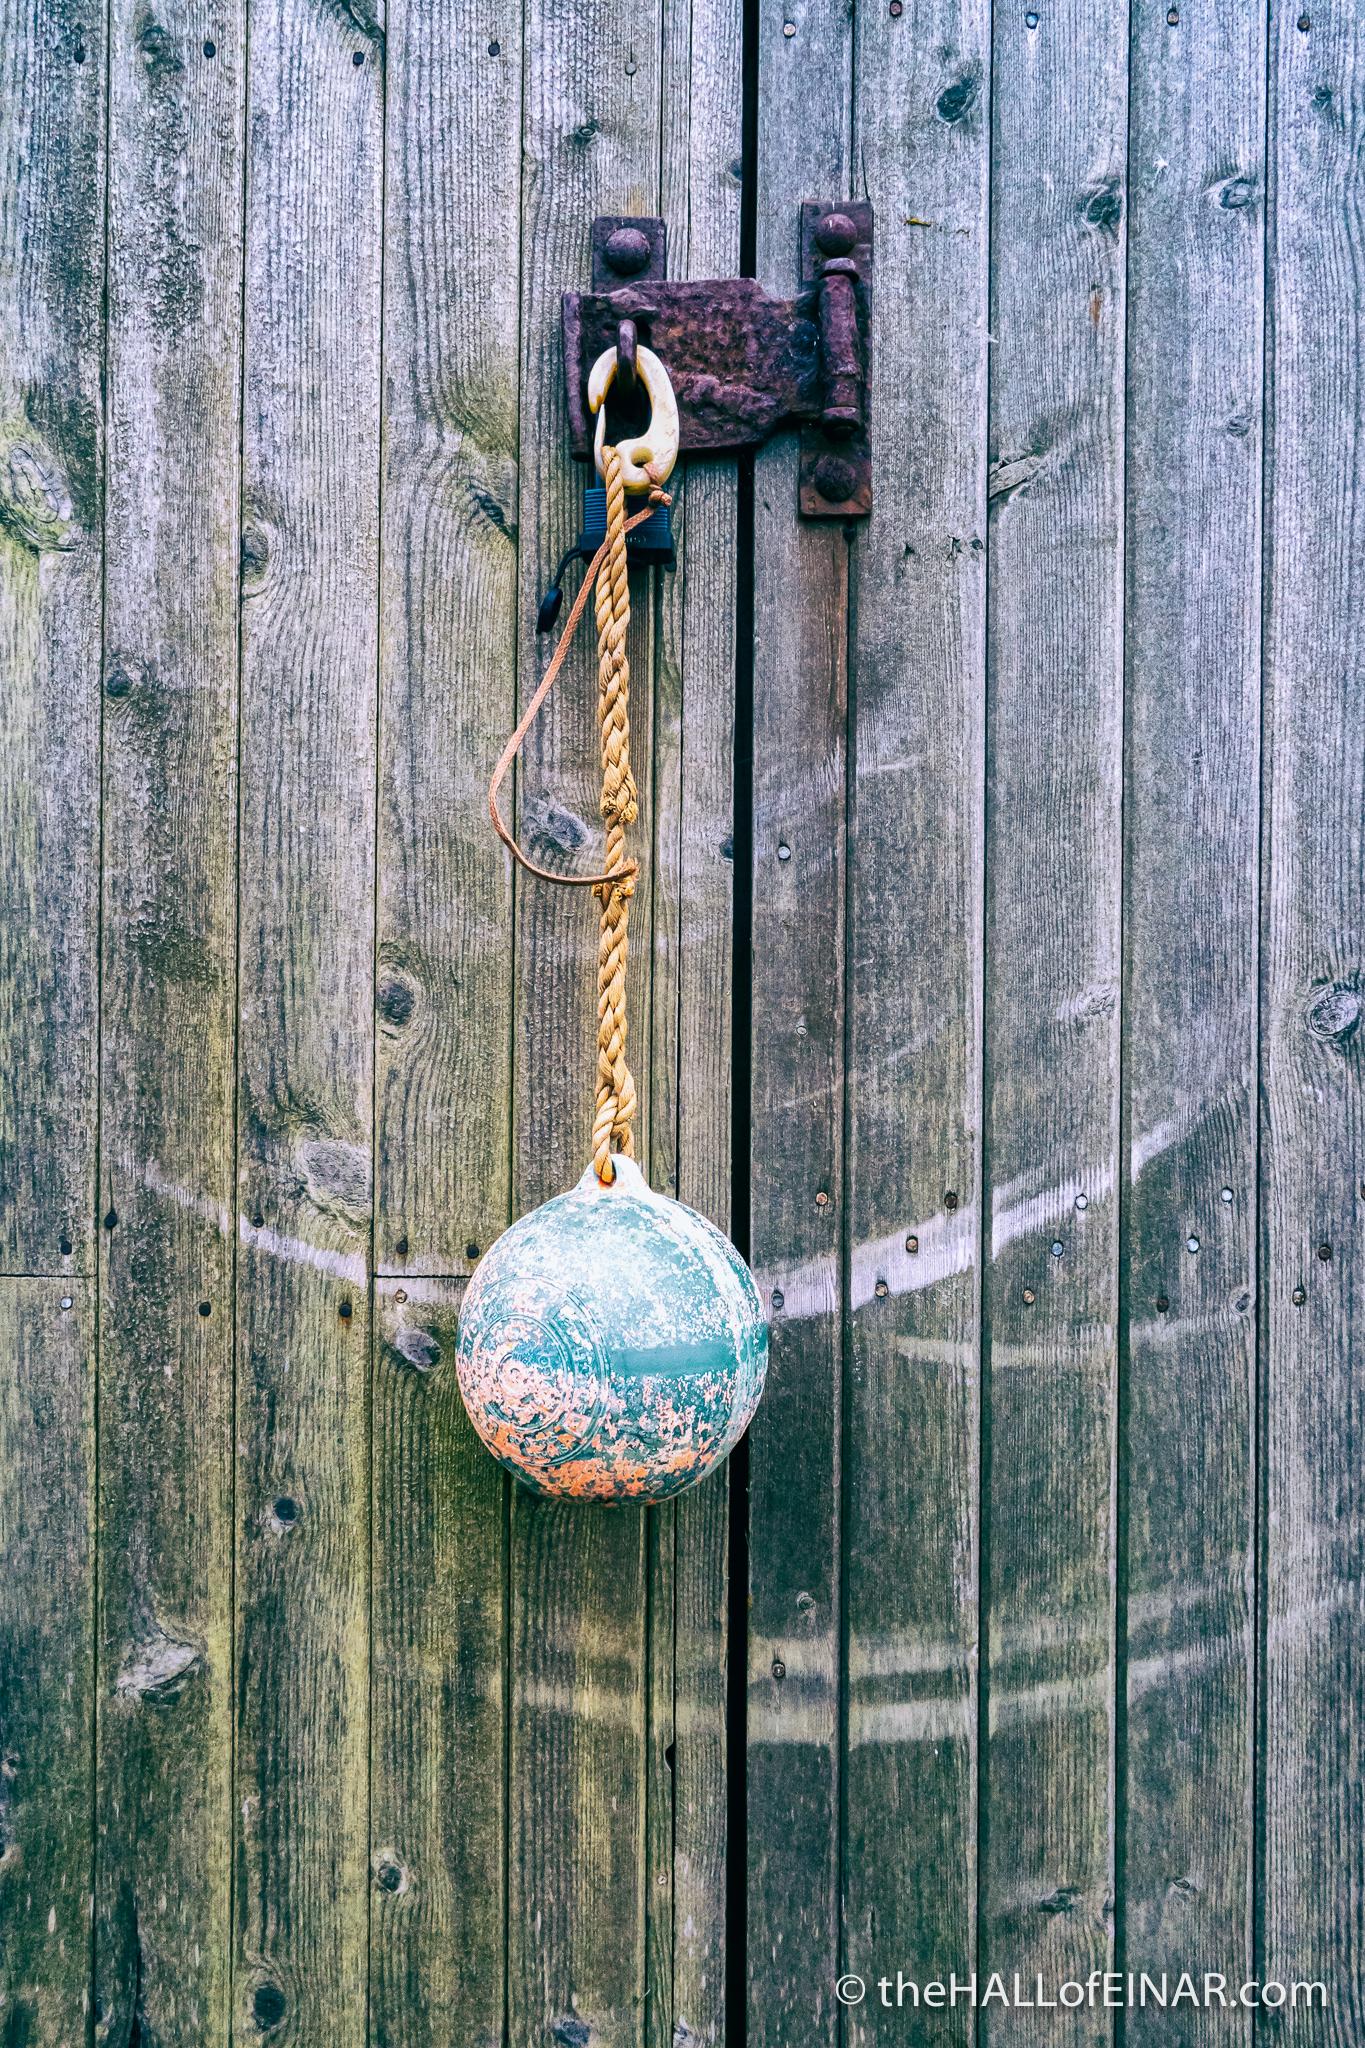 Swinging buoy - The Hall of Einar - photograph (c) David Bailey